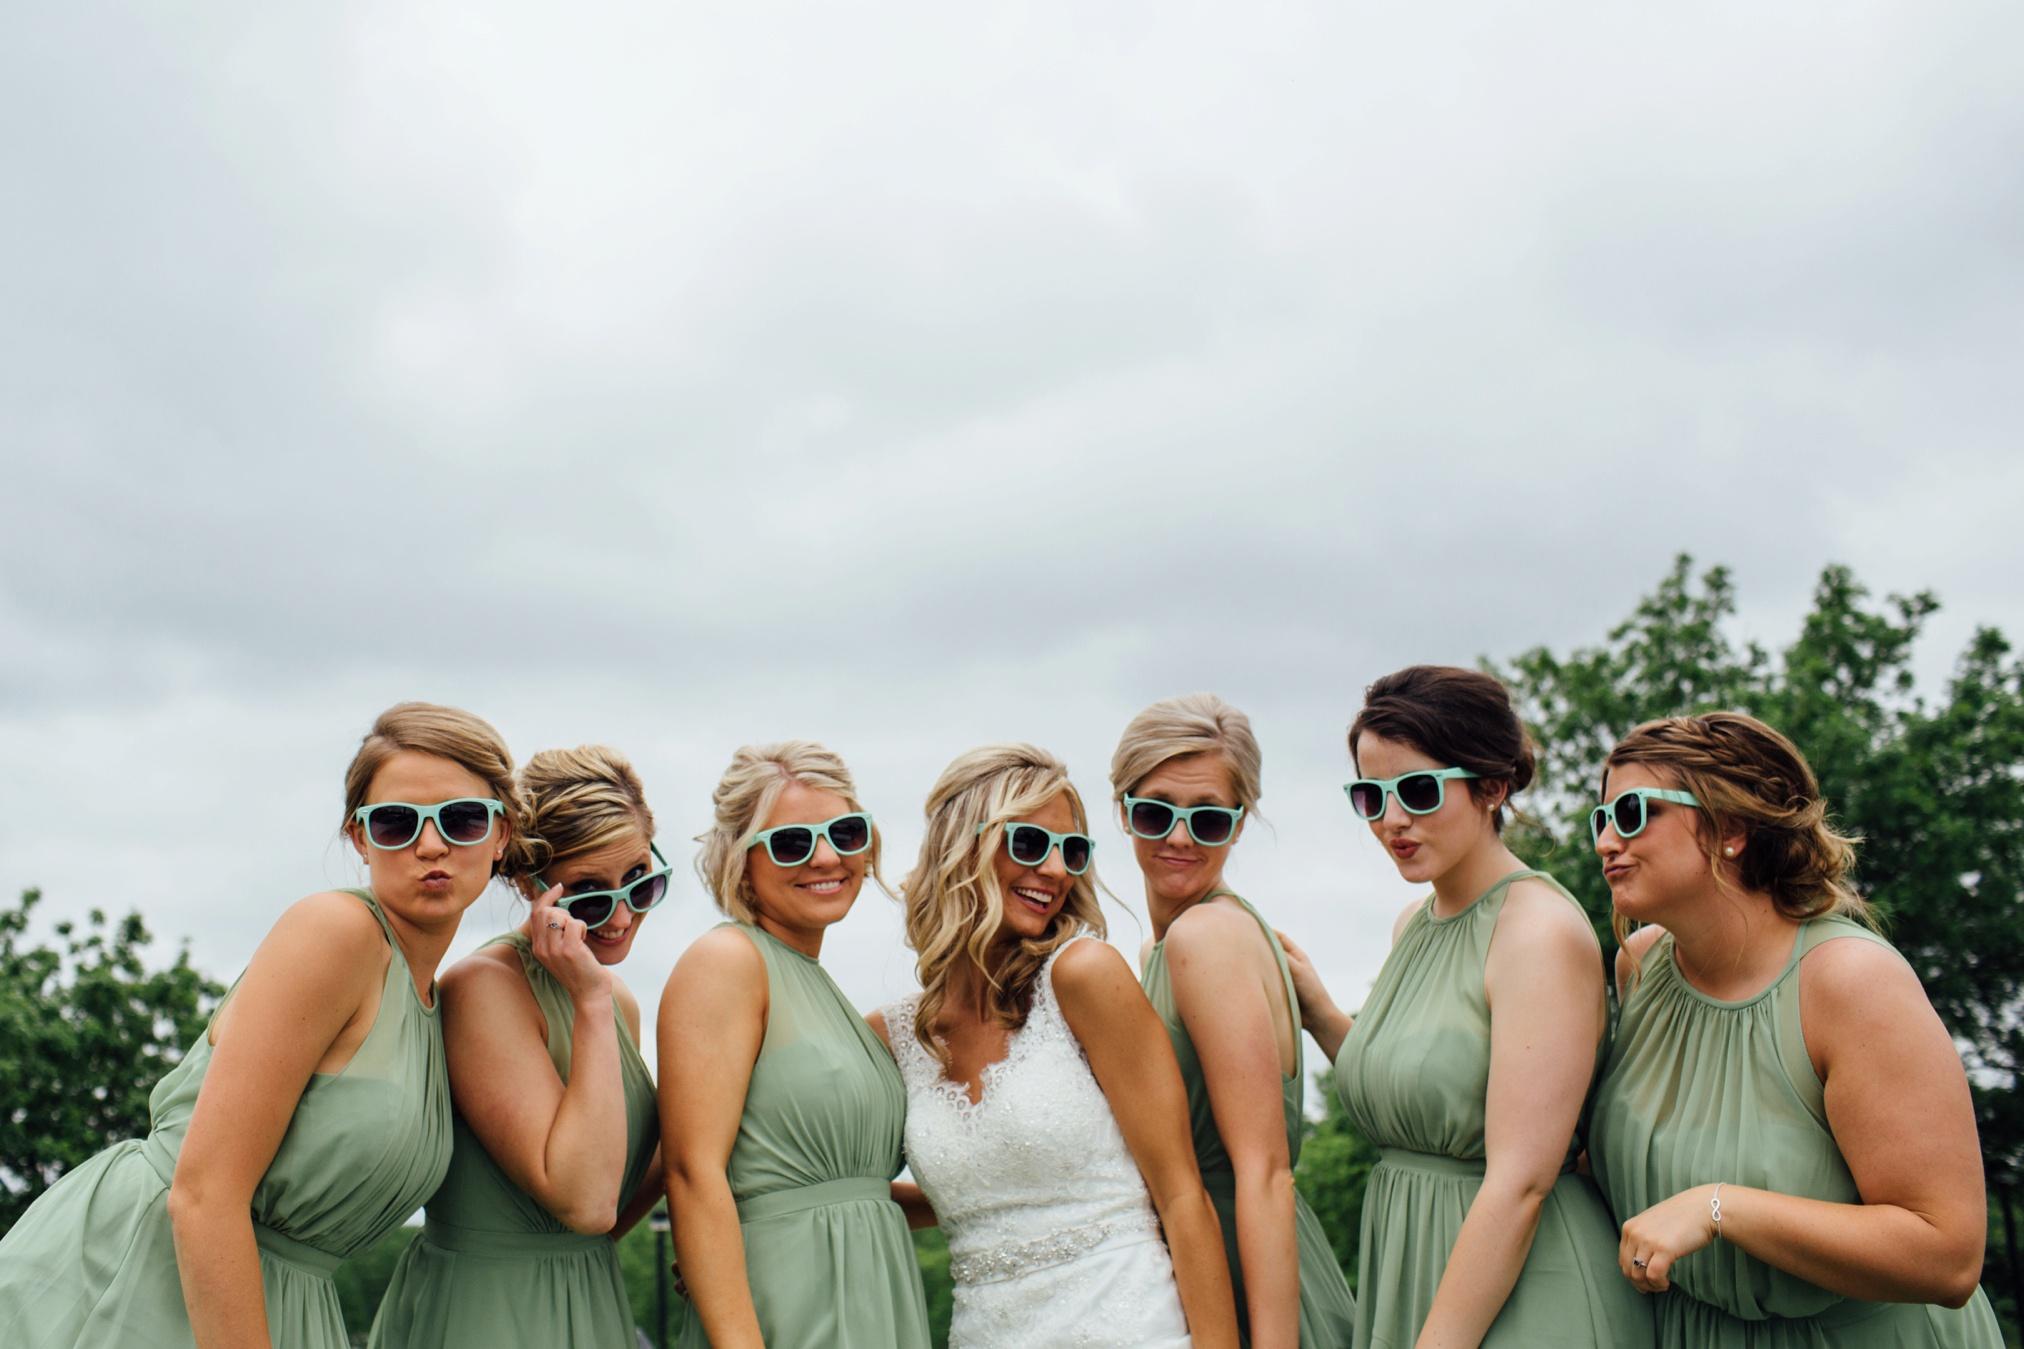 schmid_wedding-234.jpg